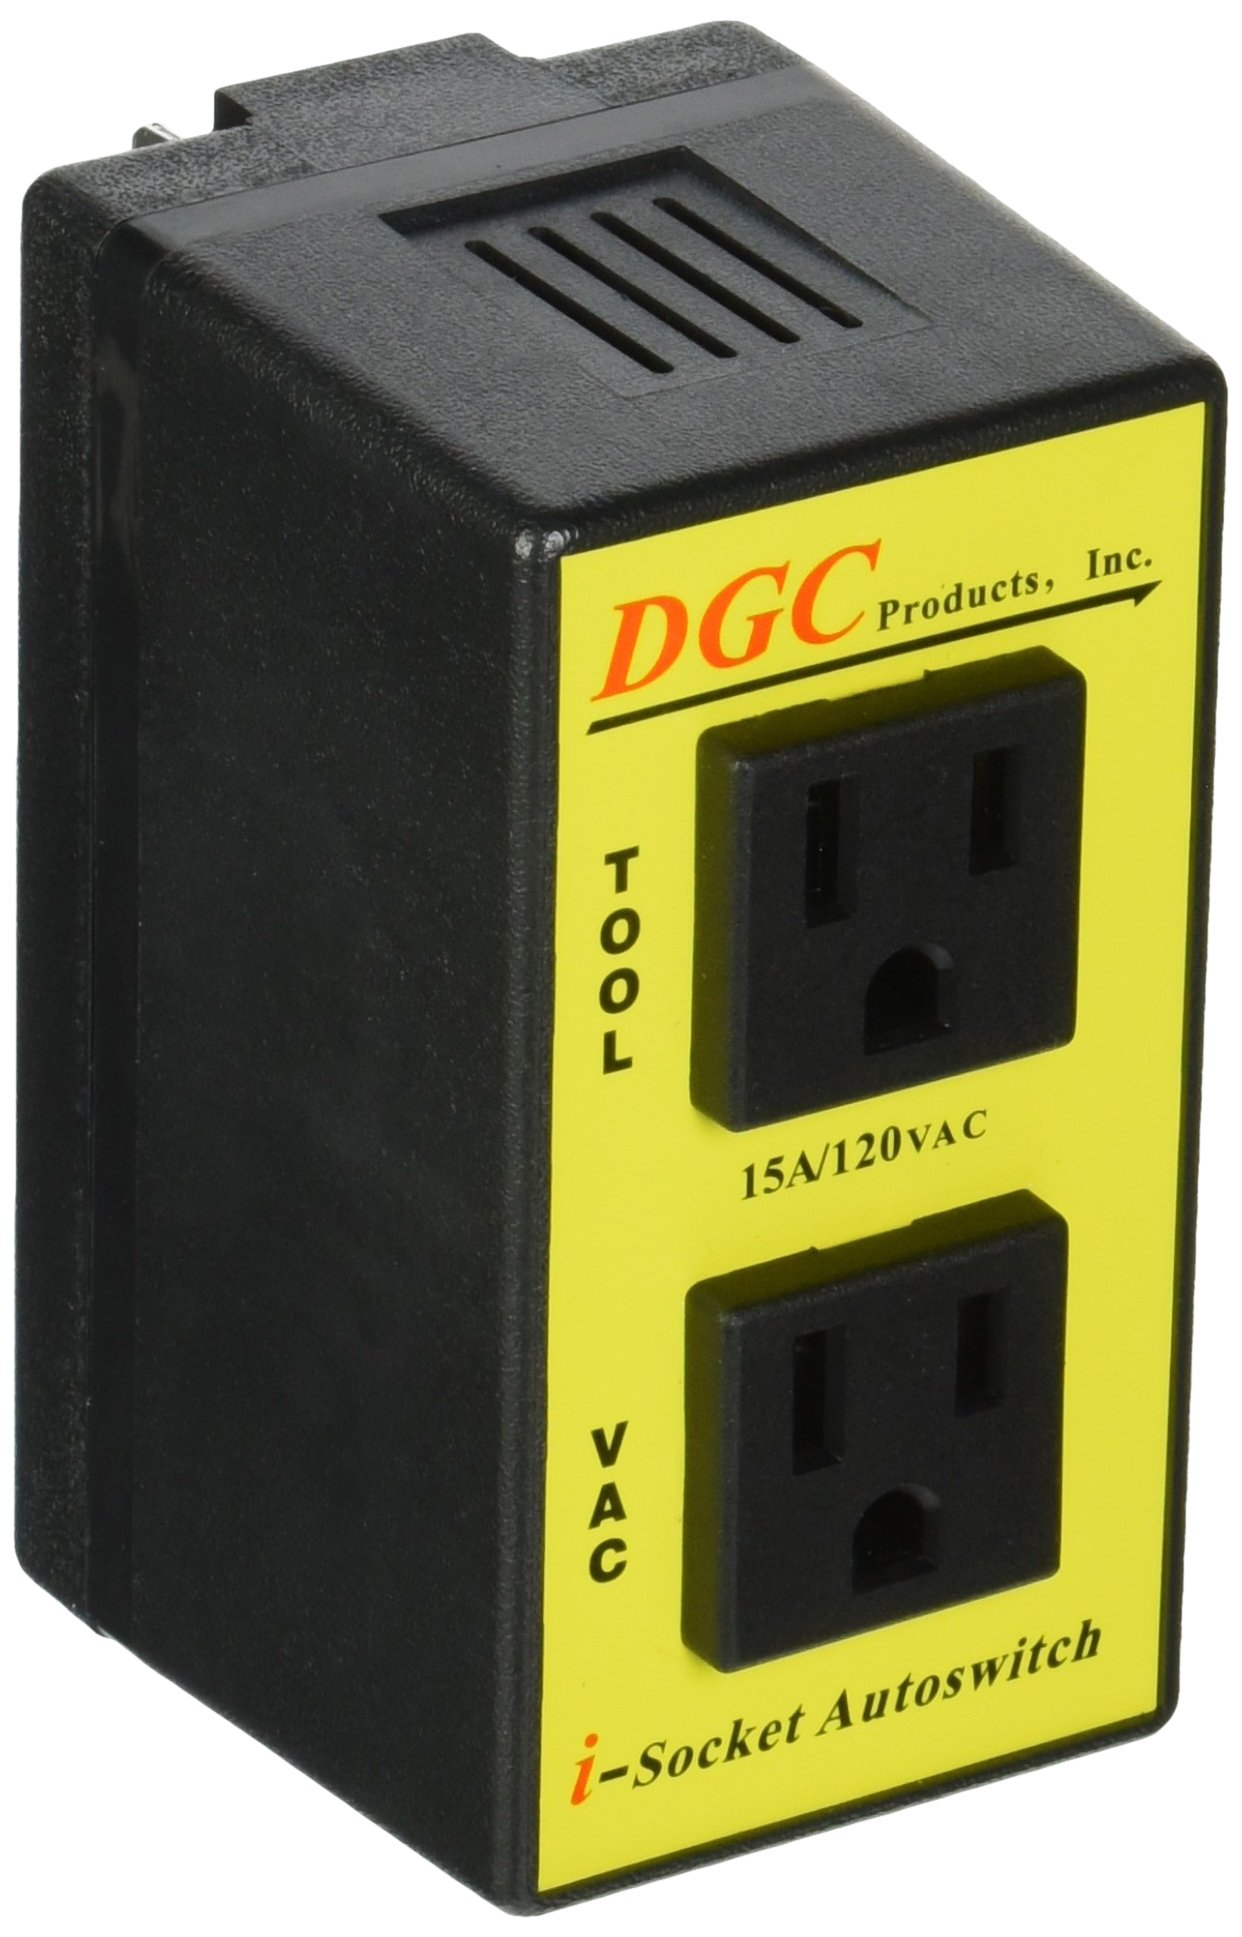 DGC PRODUCTS Intelligent Autoswitch Eliminating